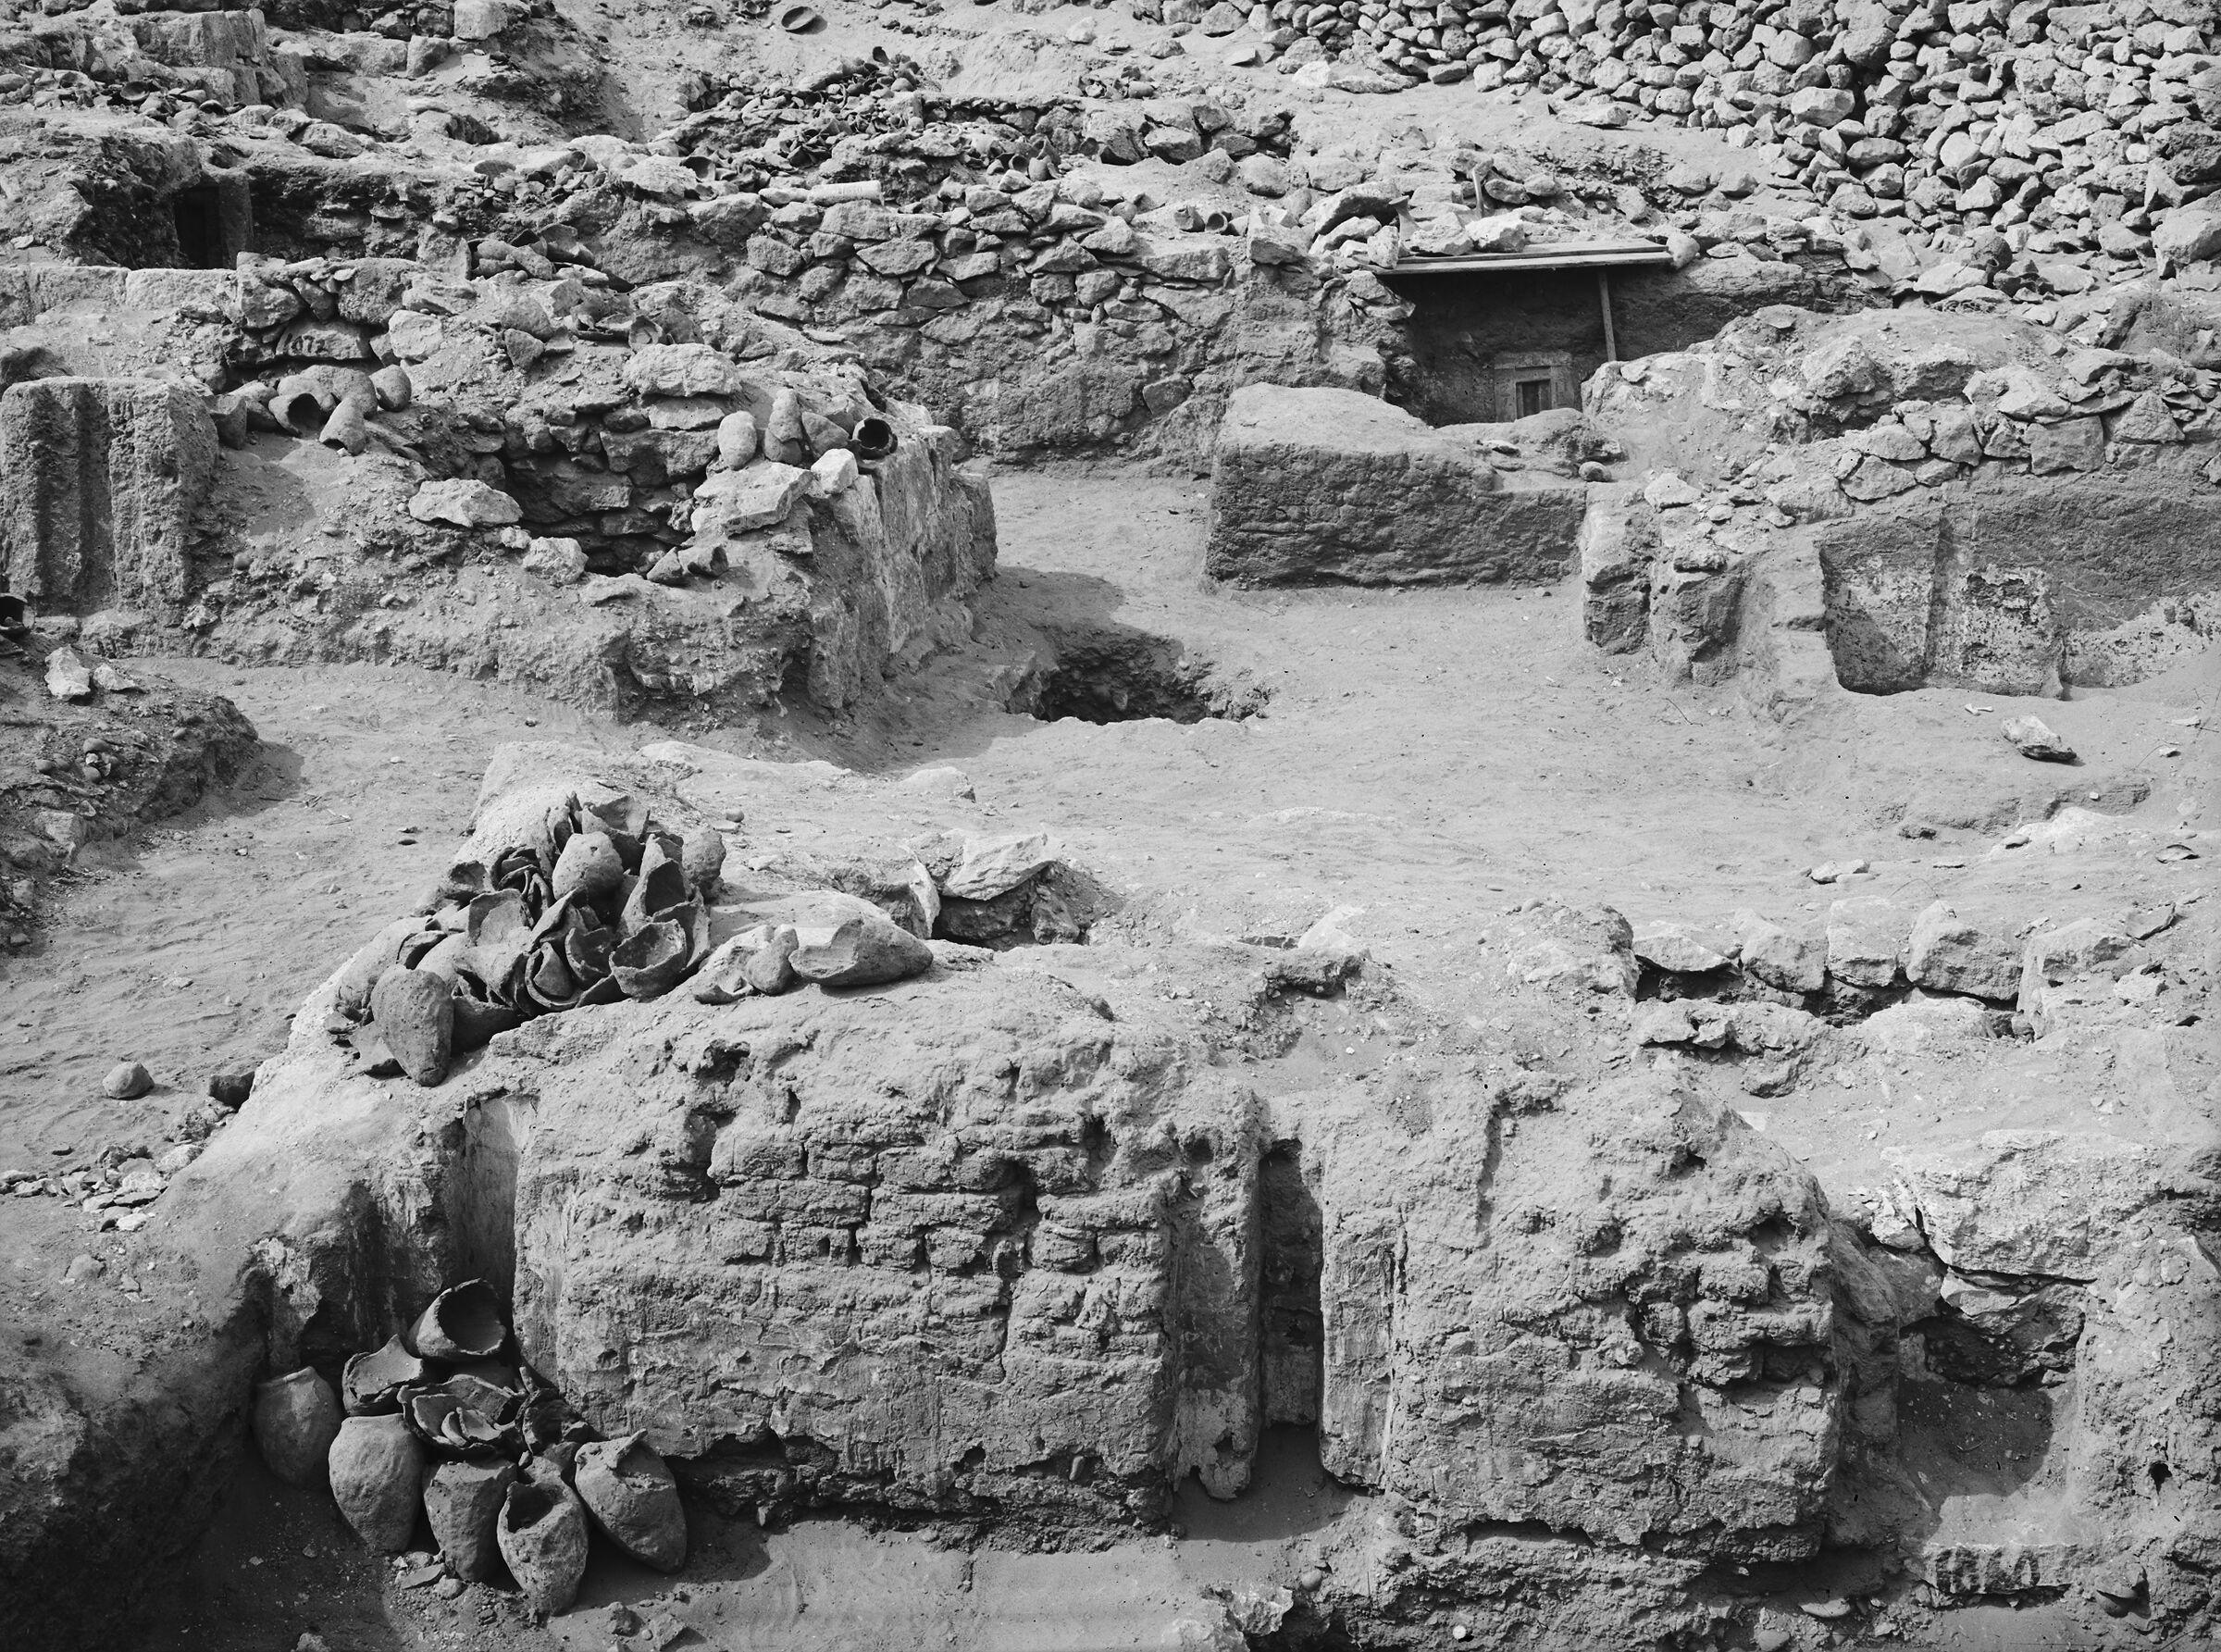 Western Cemetery: Site: Giza; View: G 1060, G 1072, G 1078, G 1080, G 1079, G 1123